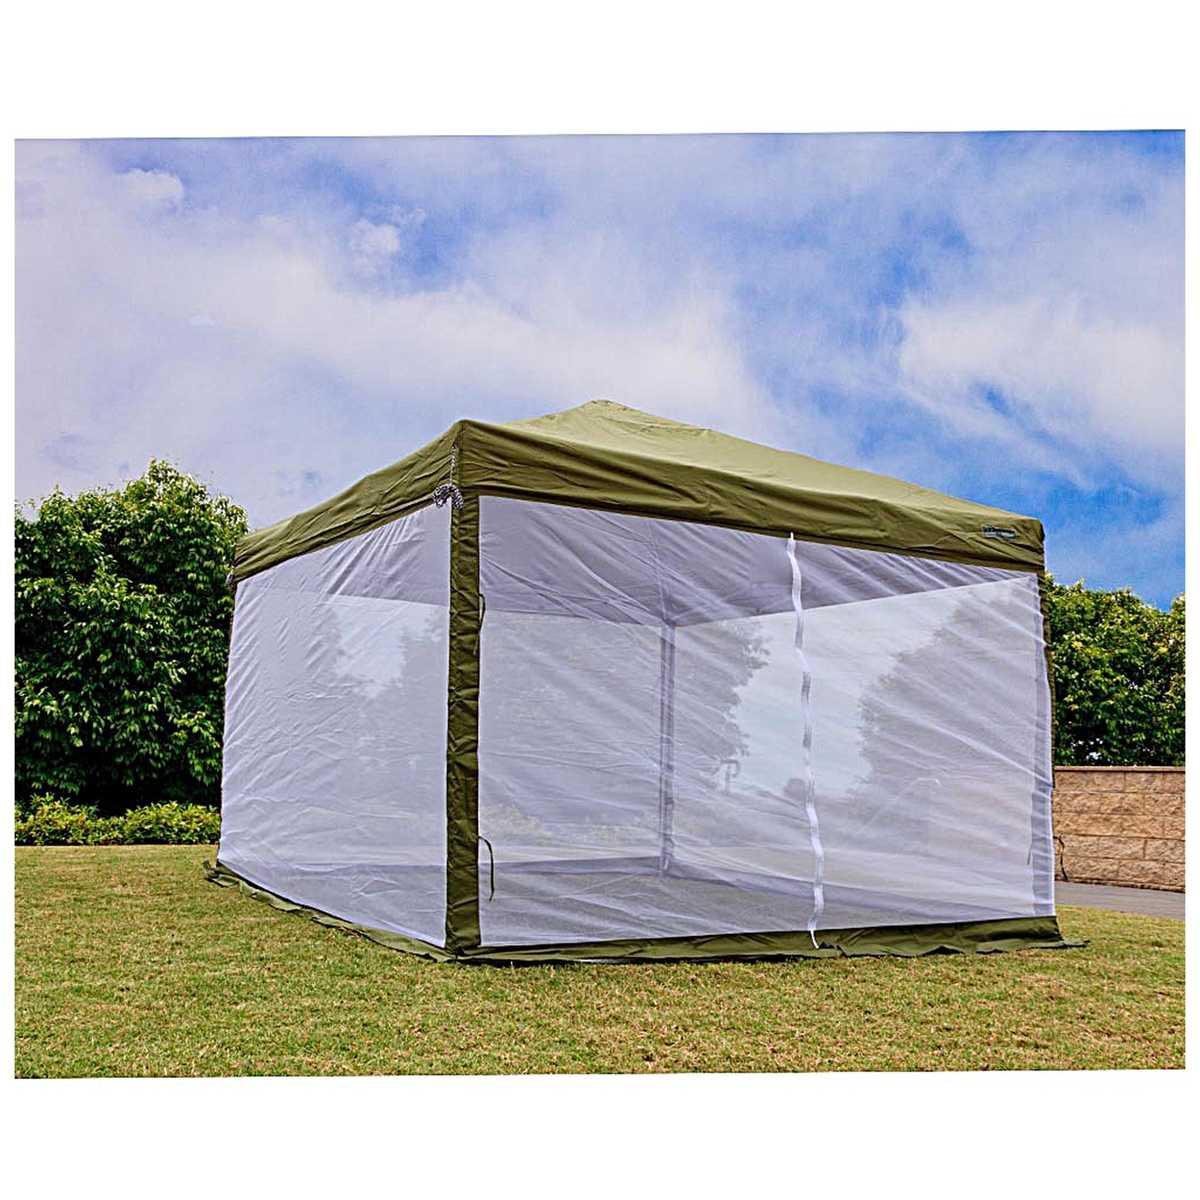 ... Outdoor Screen House Gazebos ...  sc 1 st  Pergola Design Ideas & The Comfortable Outdoor Screened Gazebo | Pergola Design Ideas